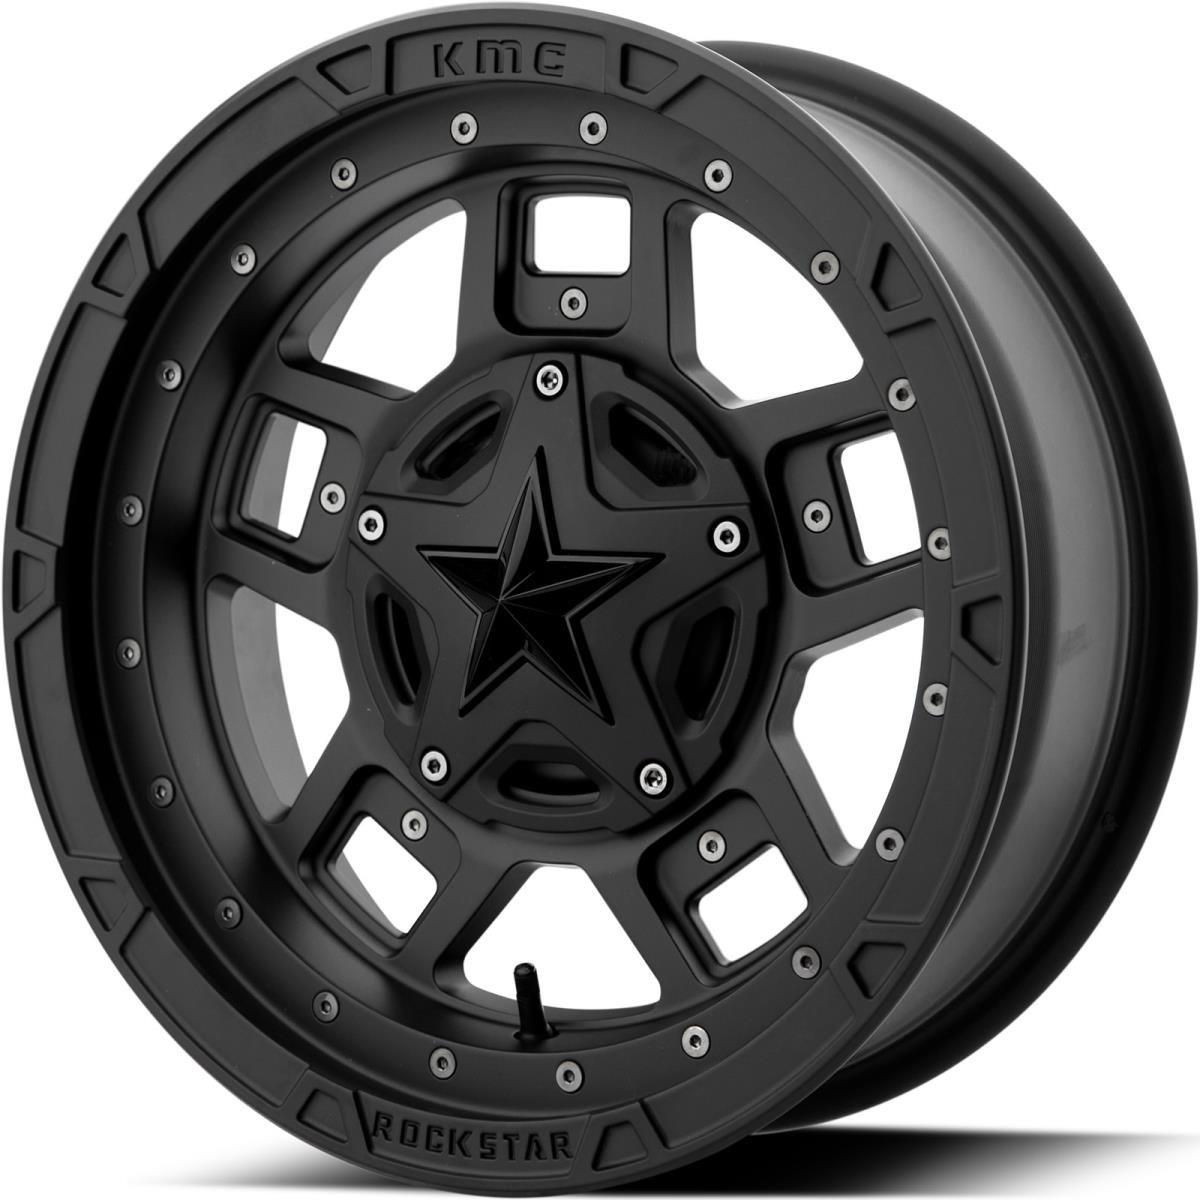 XD Series XS827 Rockstar 3 ATV/UTV 14x7 4x156 +0mm Matte Black Wheel Rim